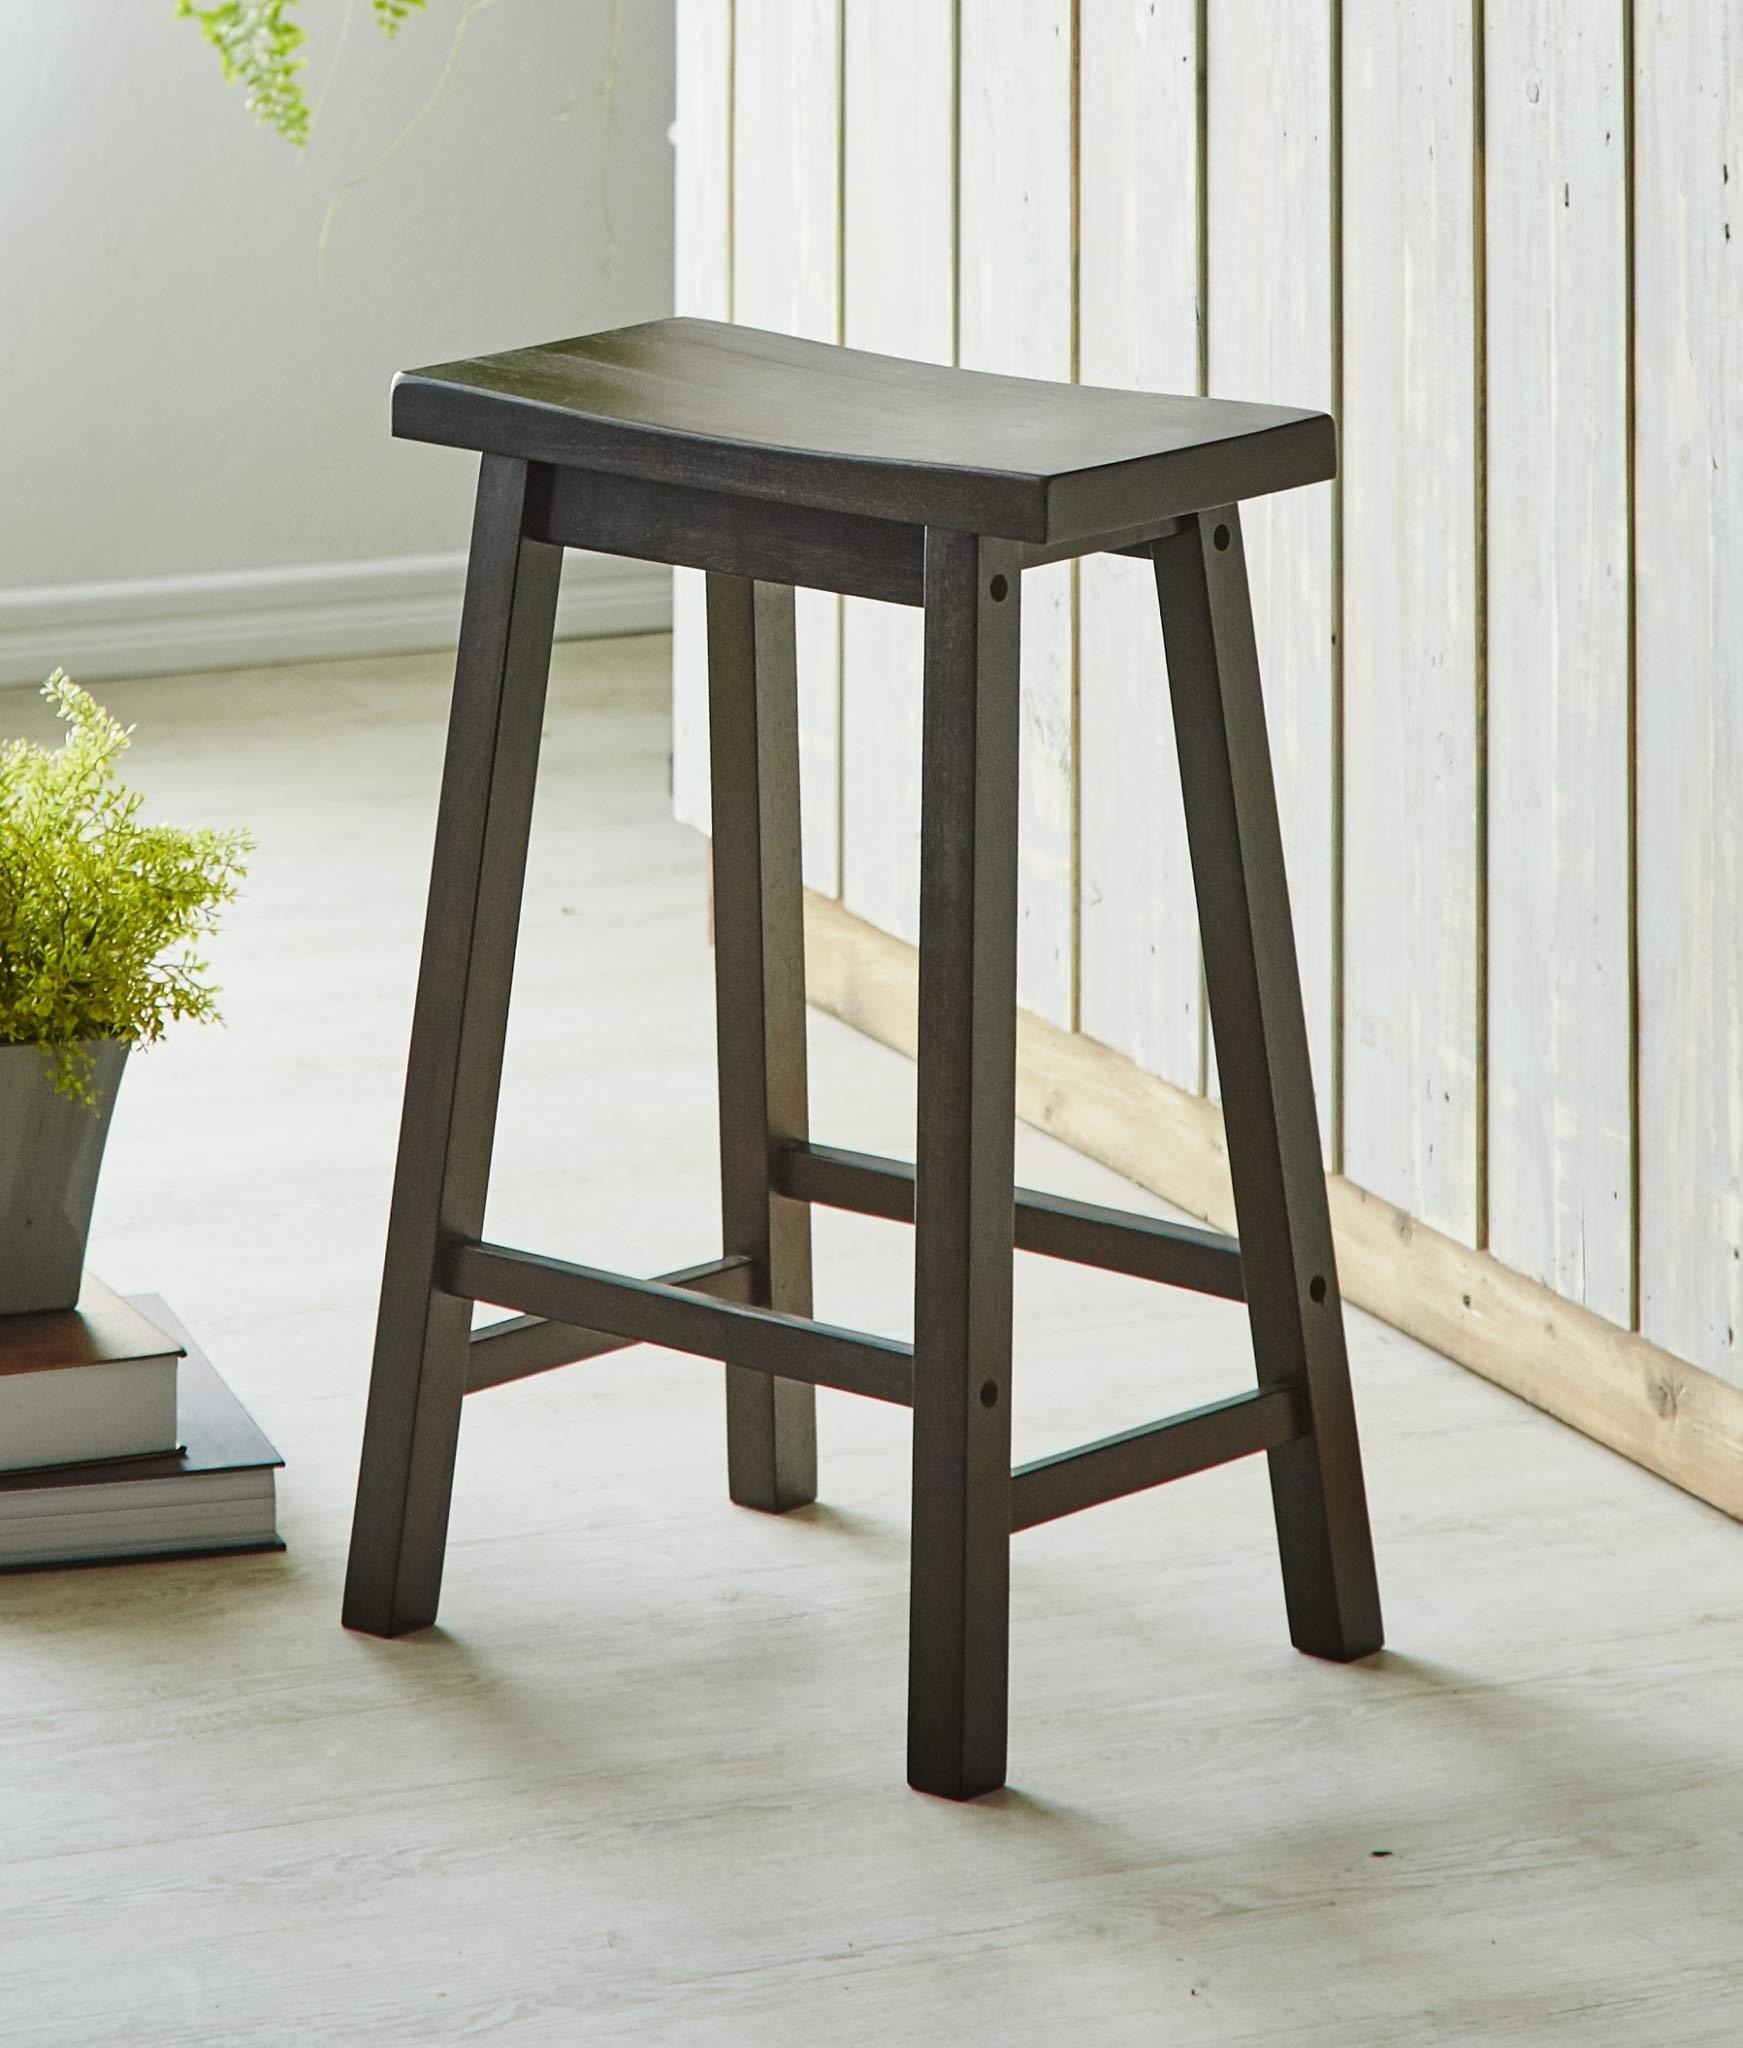 PJ Wood 24-Inch Saddle Seat Counter Stool - Walnut by PJ Wood (Image #2)